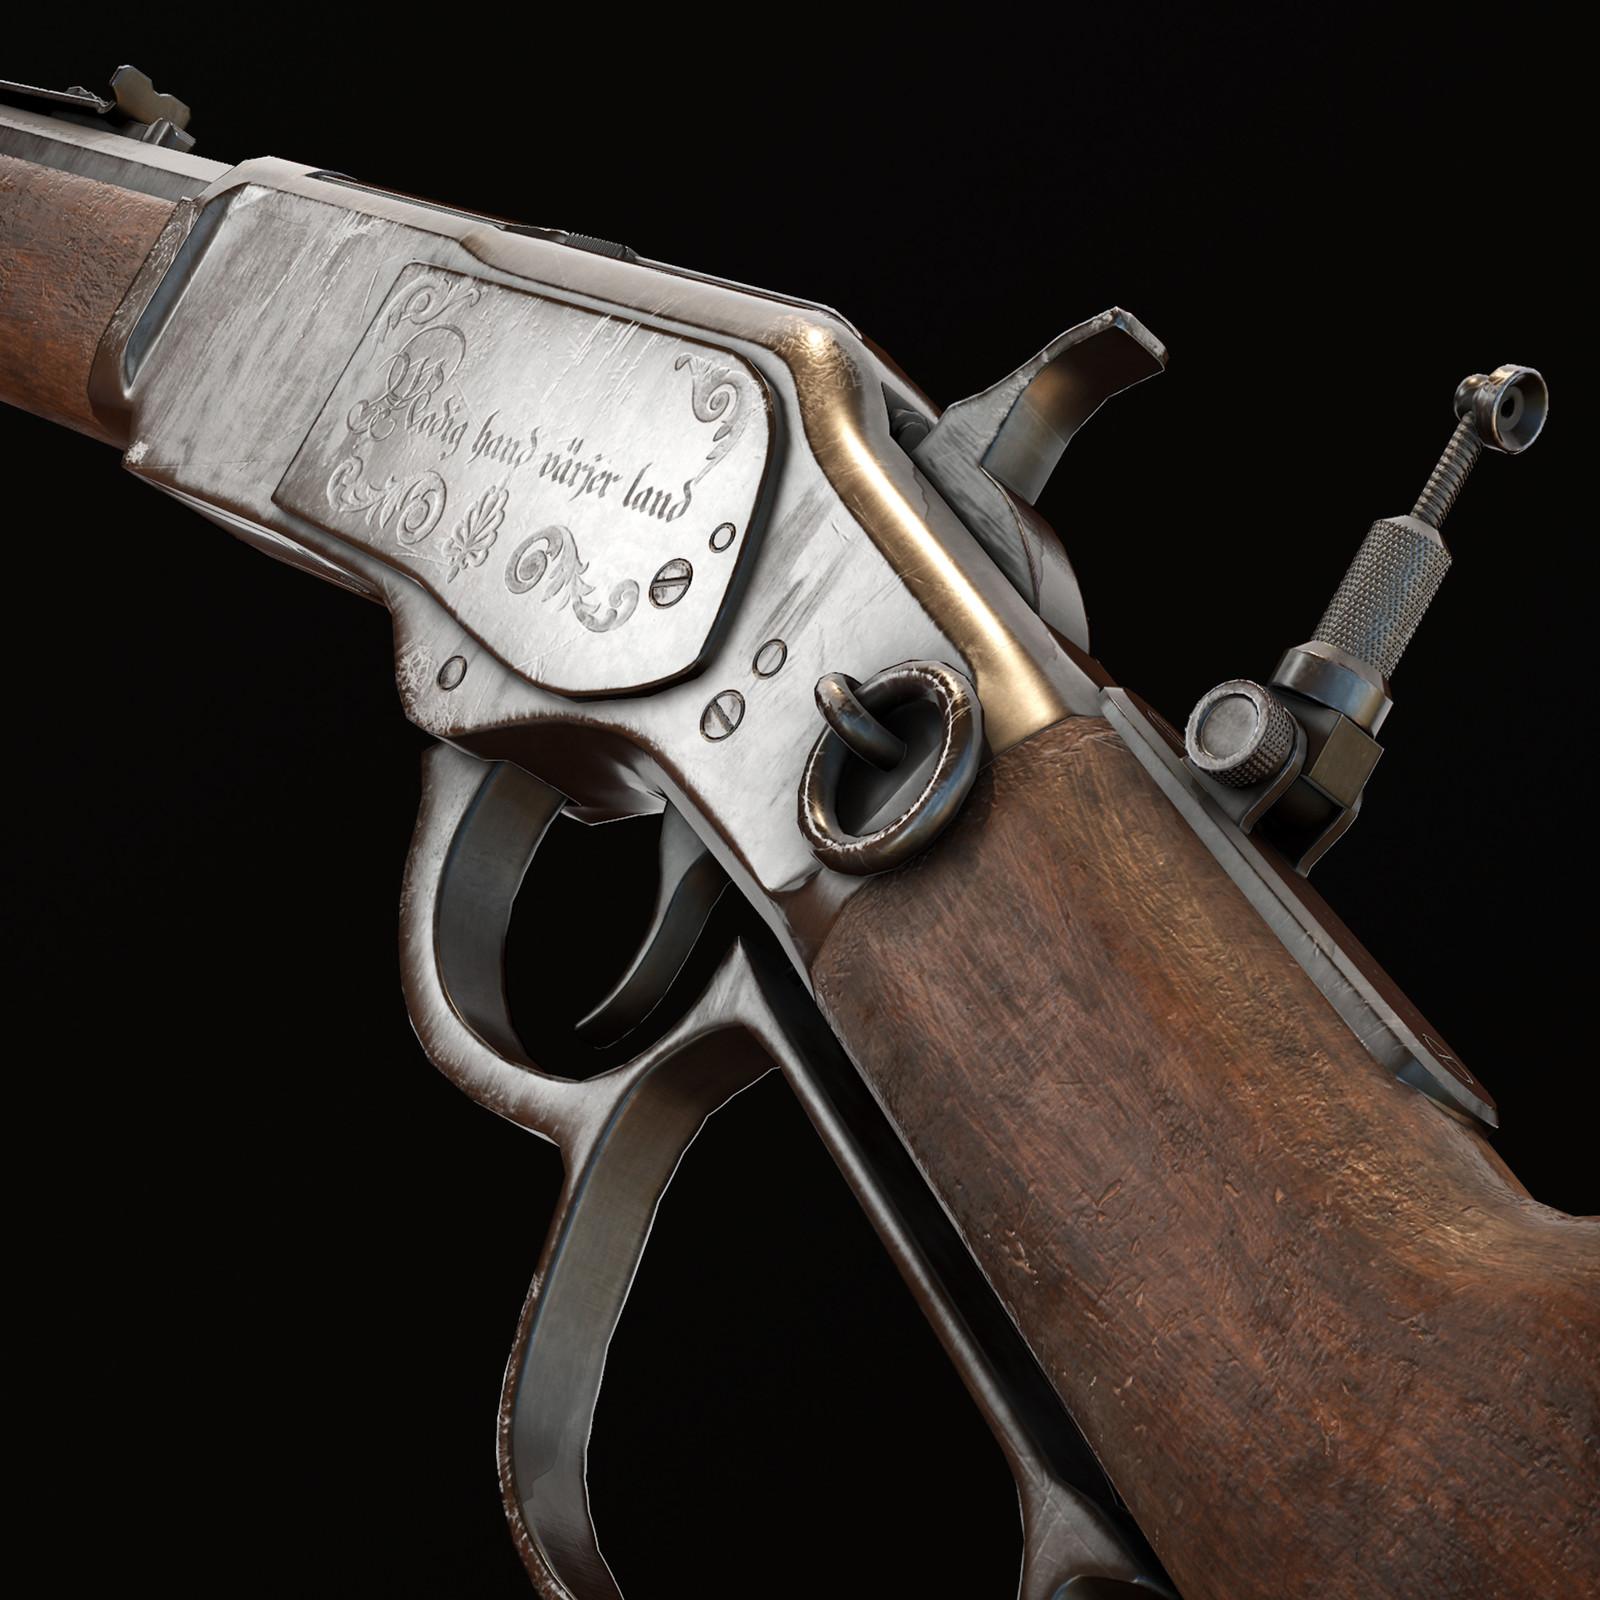 1873 Winchester - 06/18